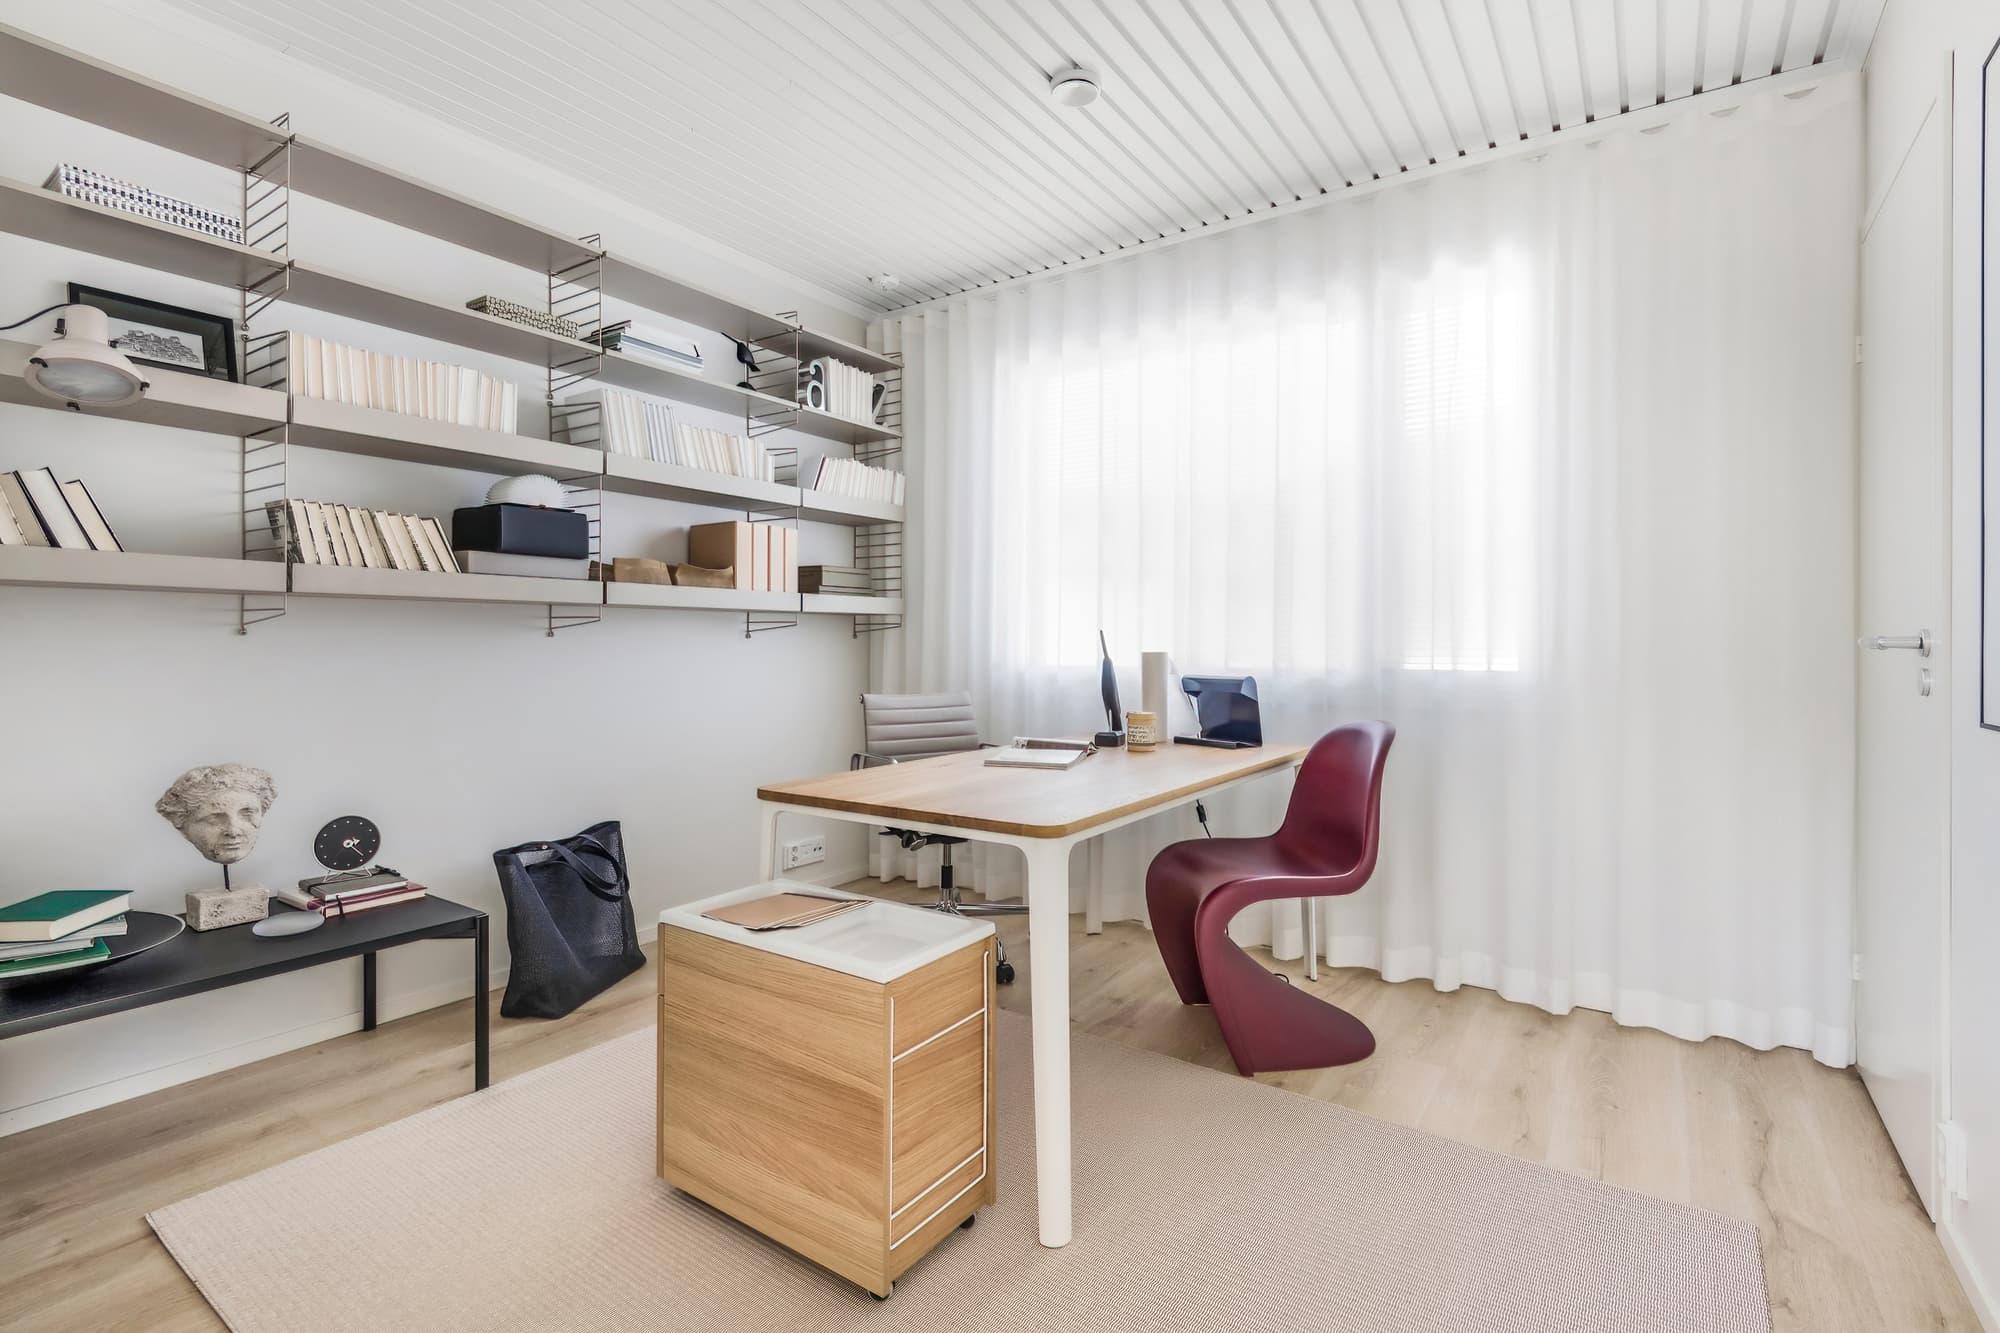 kannustalon-suomi-messutalo-2021-tyohuone